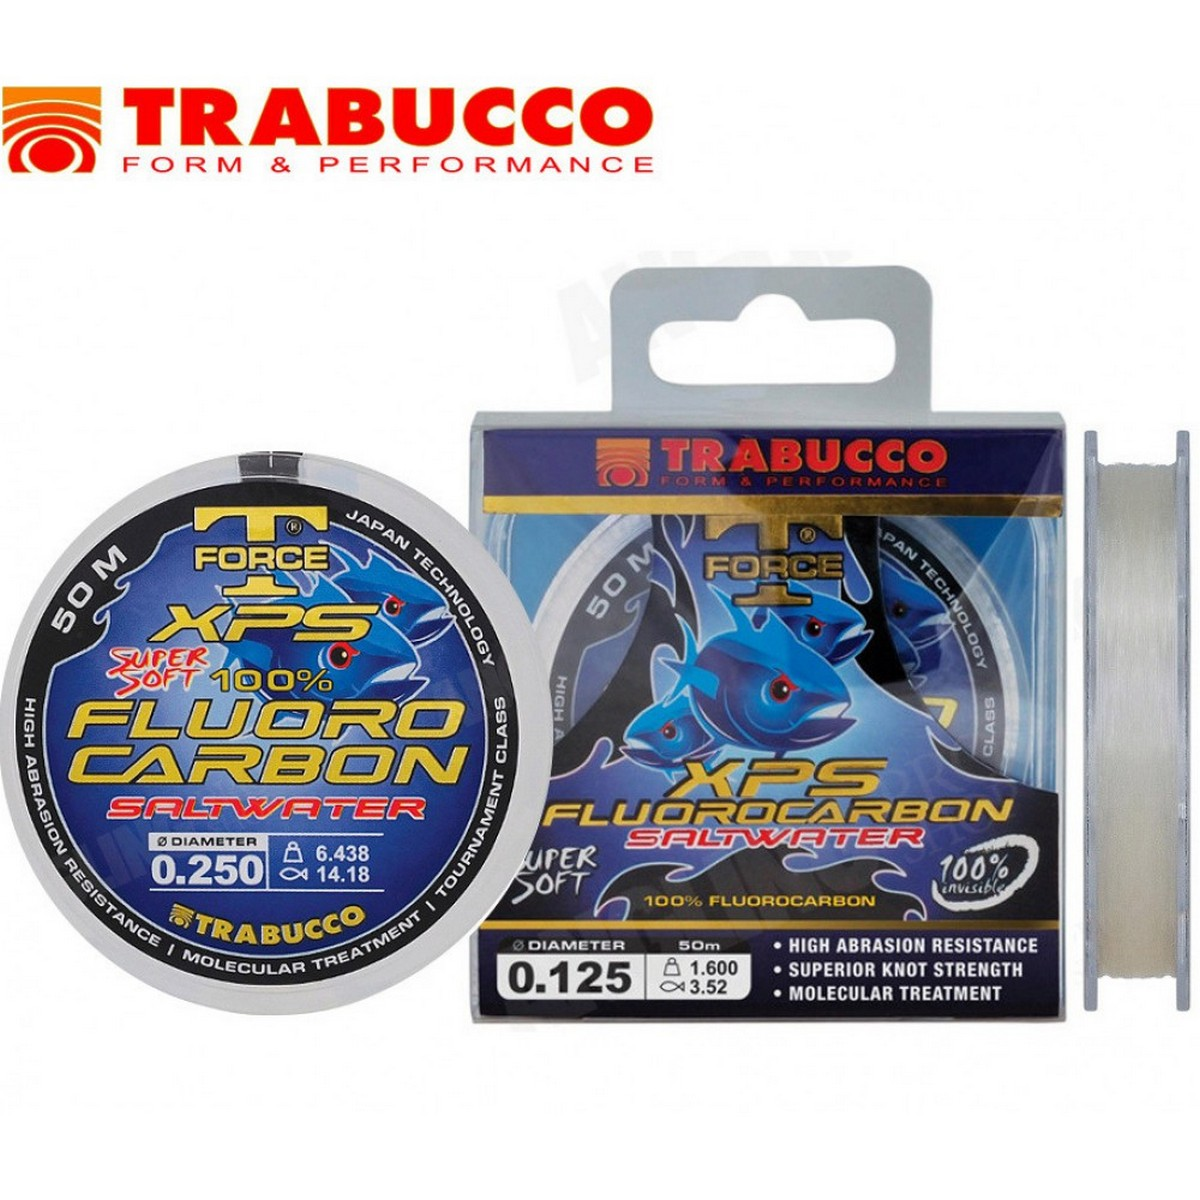 Флуорокарбон Trabucco XPS Fluorocarbon Saltwater 50m